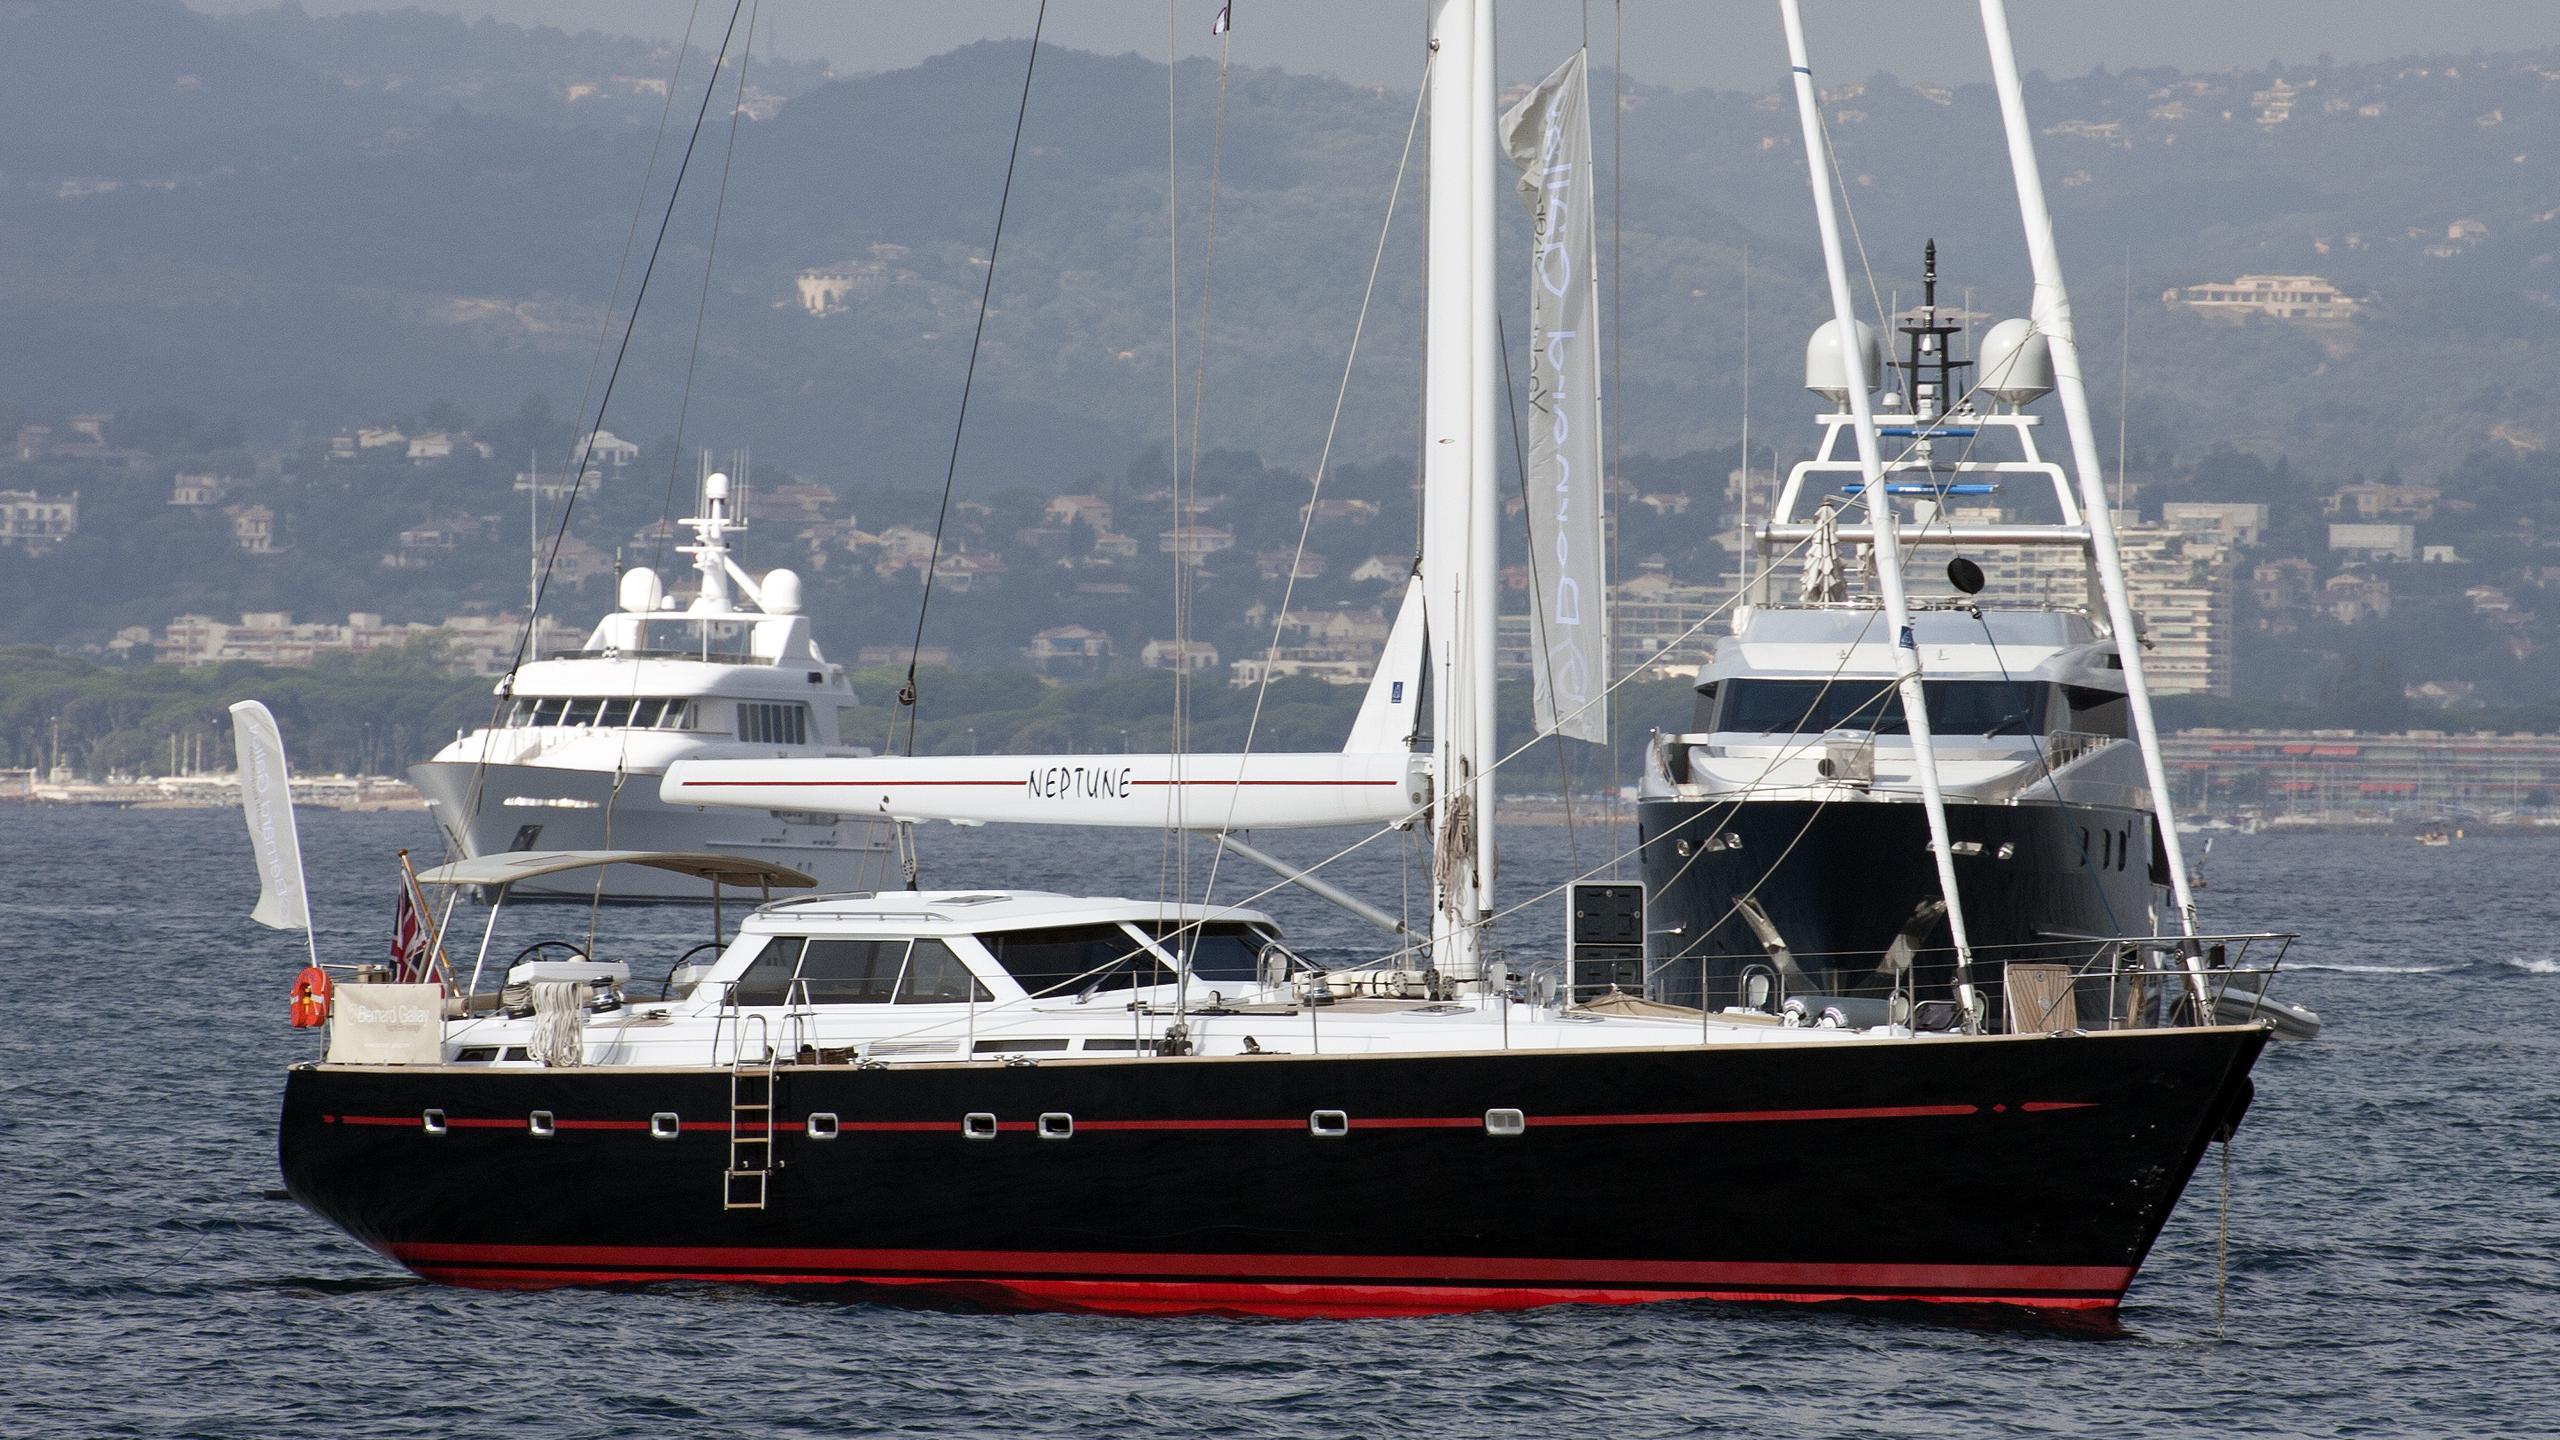 neptune-yacht-exterior